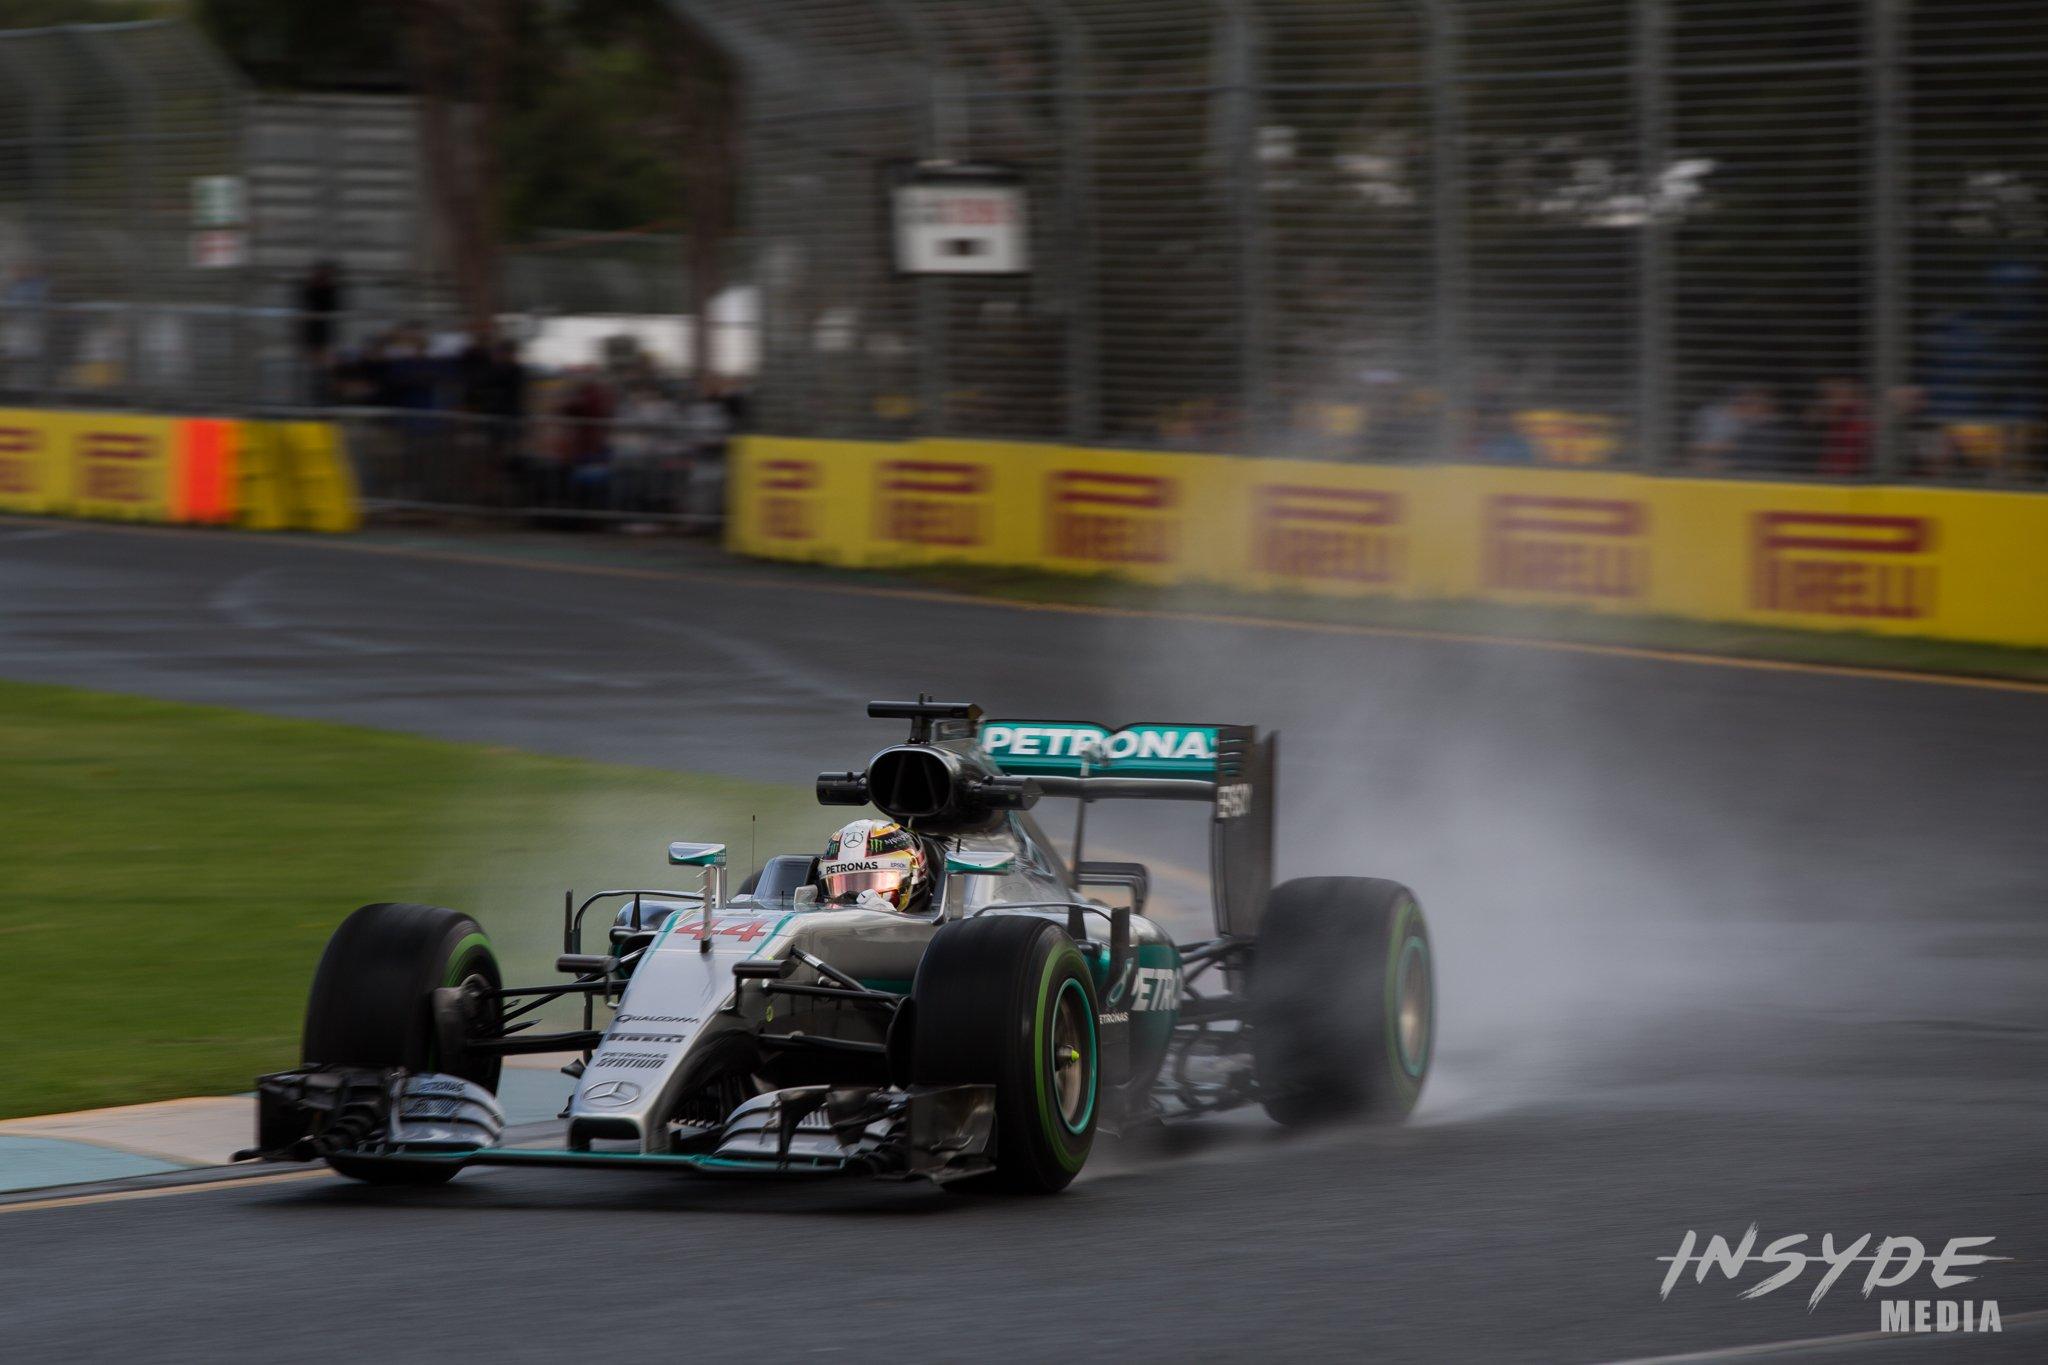 Motorsport-F1-InSydeMedia-003